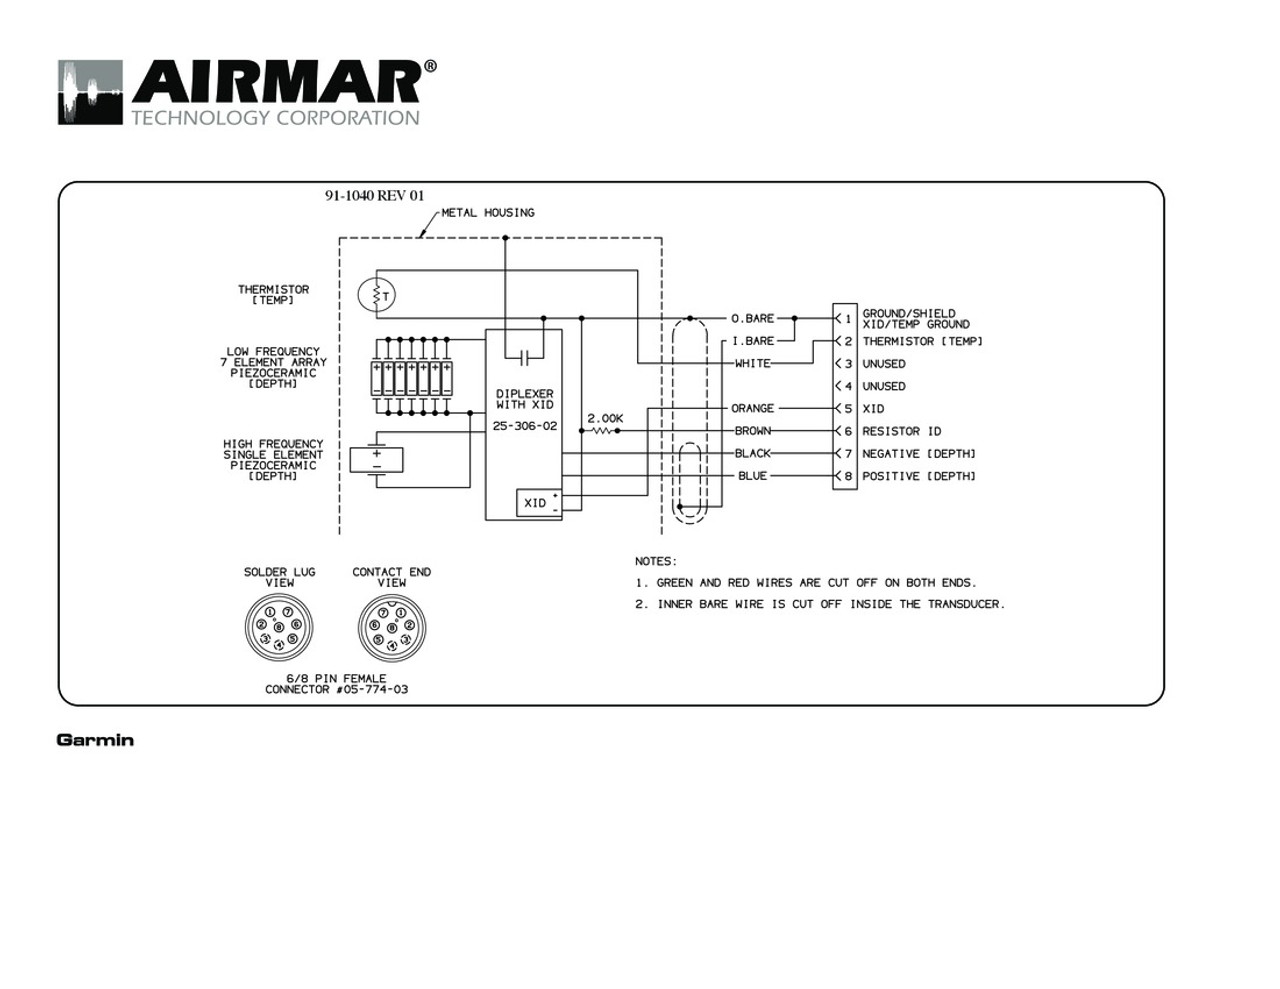 Brilliant Garmin 4 Pin Wiring Diagram Wiring Diagram Online Wiring Digital Resources Dylitashwinbiharinl